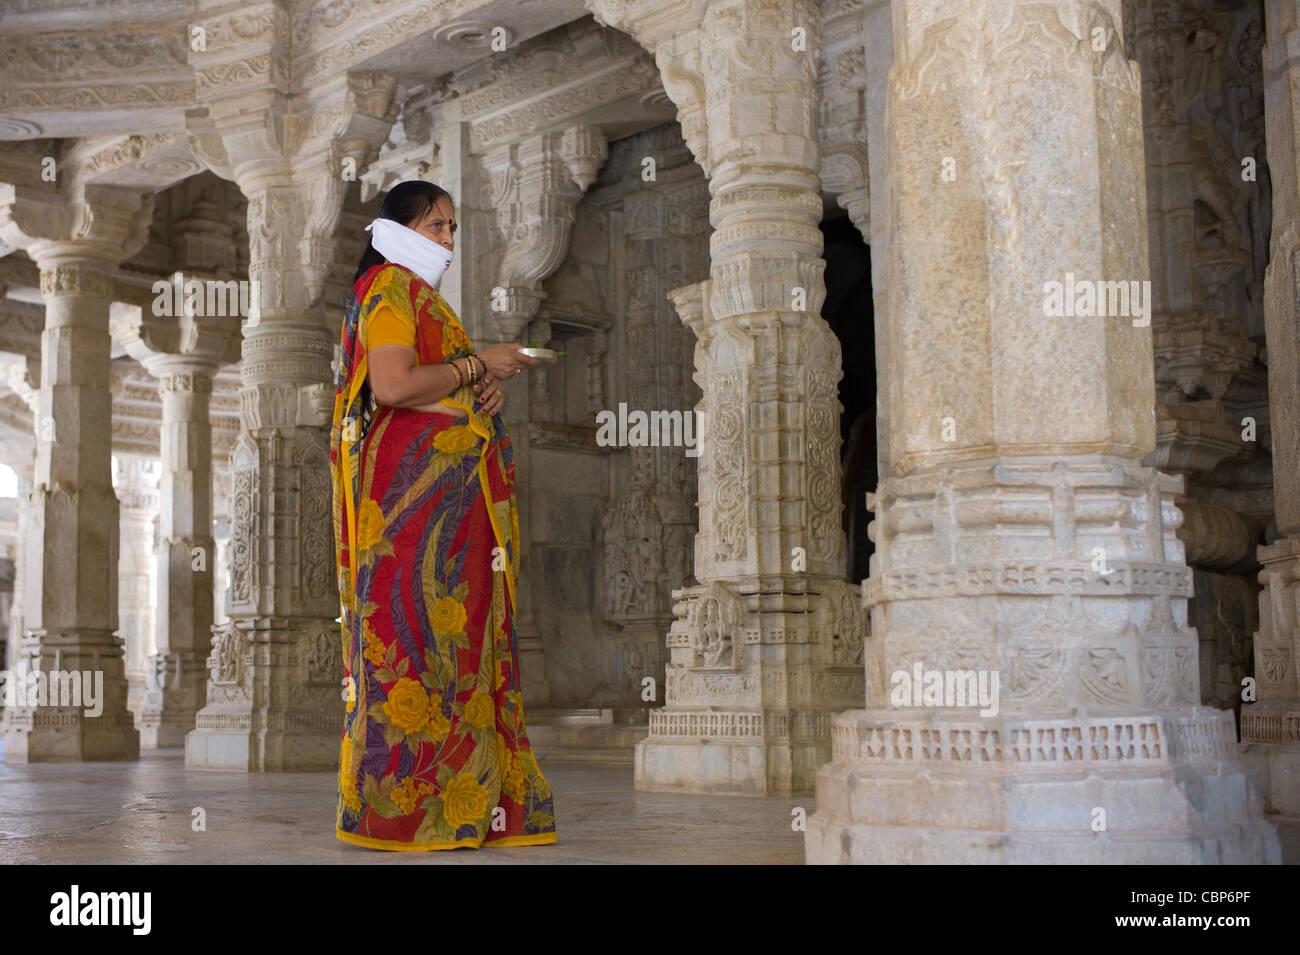 Jain pilgrim with traditional mask at The Ranakpur Jain Temple at Desuri Tehsil in Pali District, Rajasthan, India - Stock Image